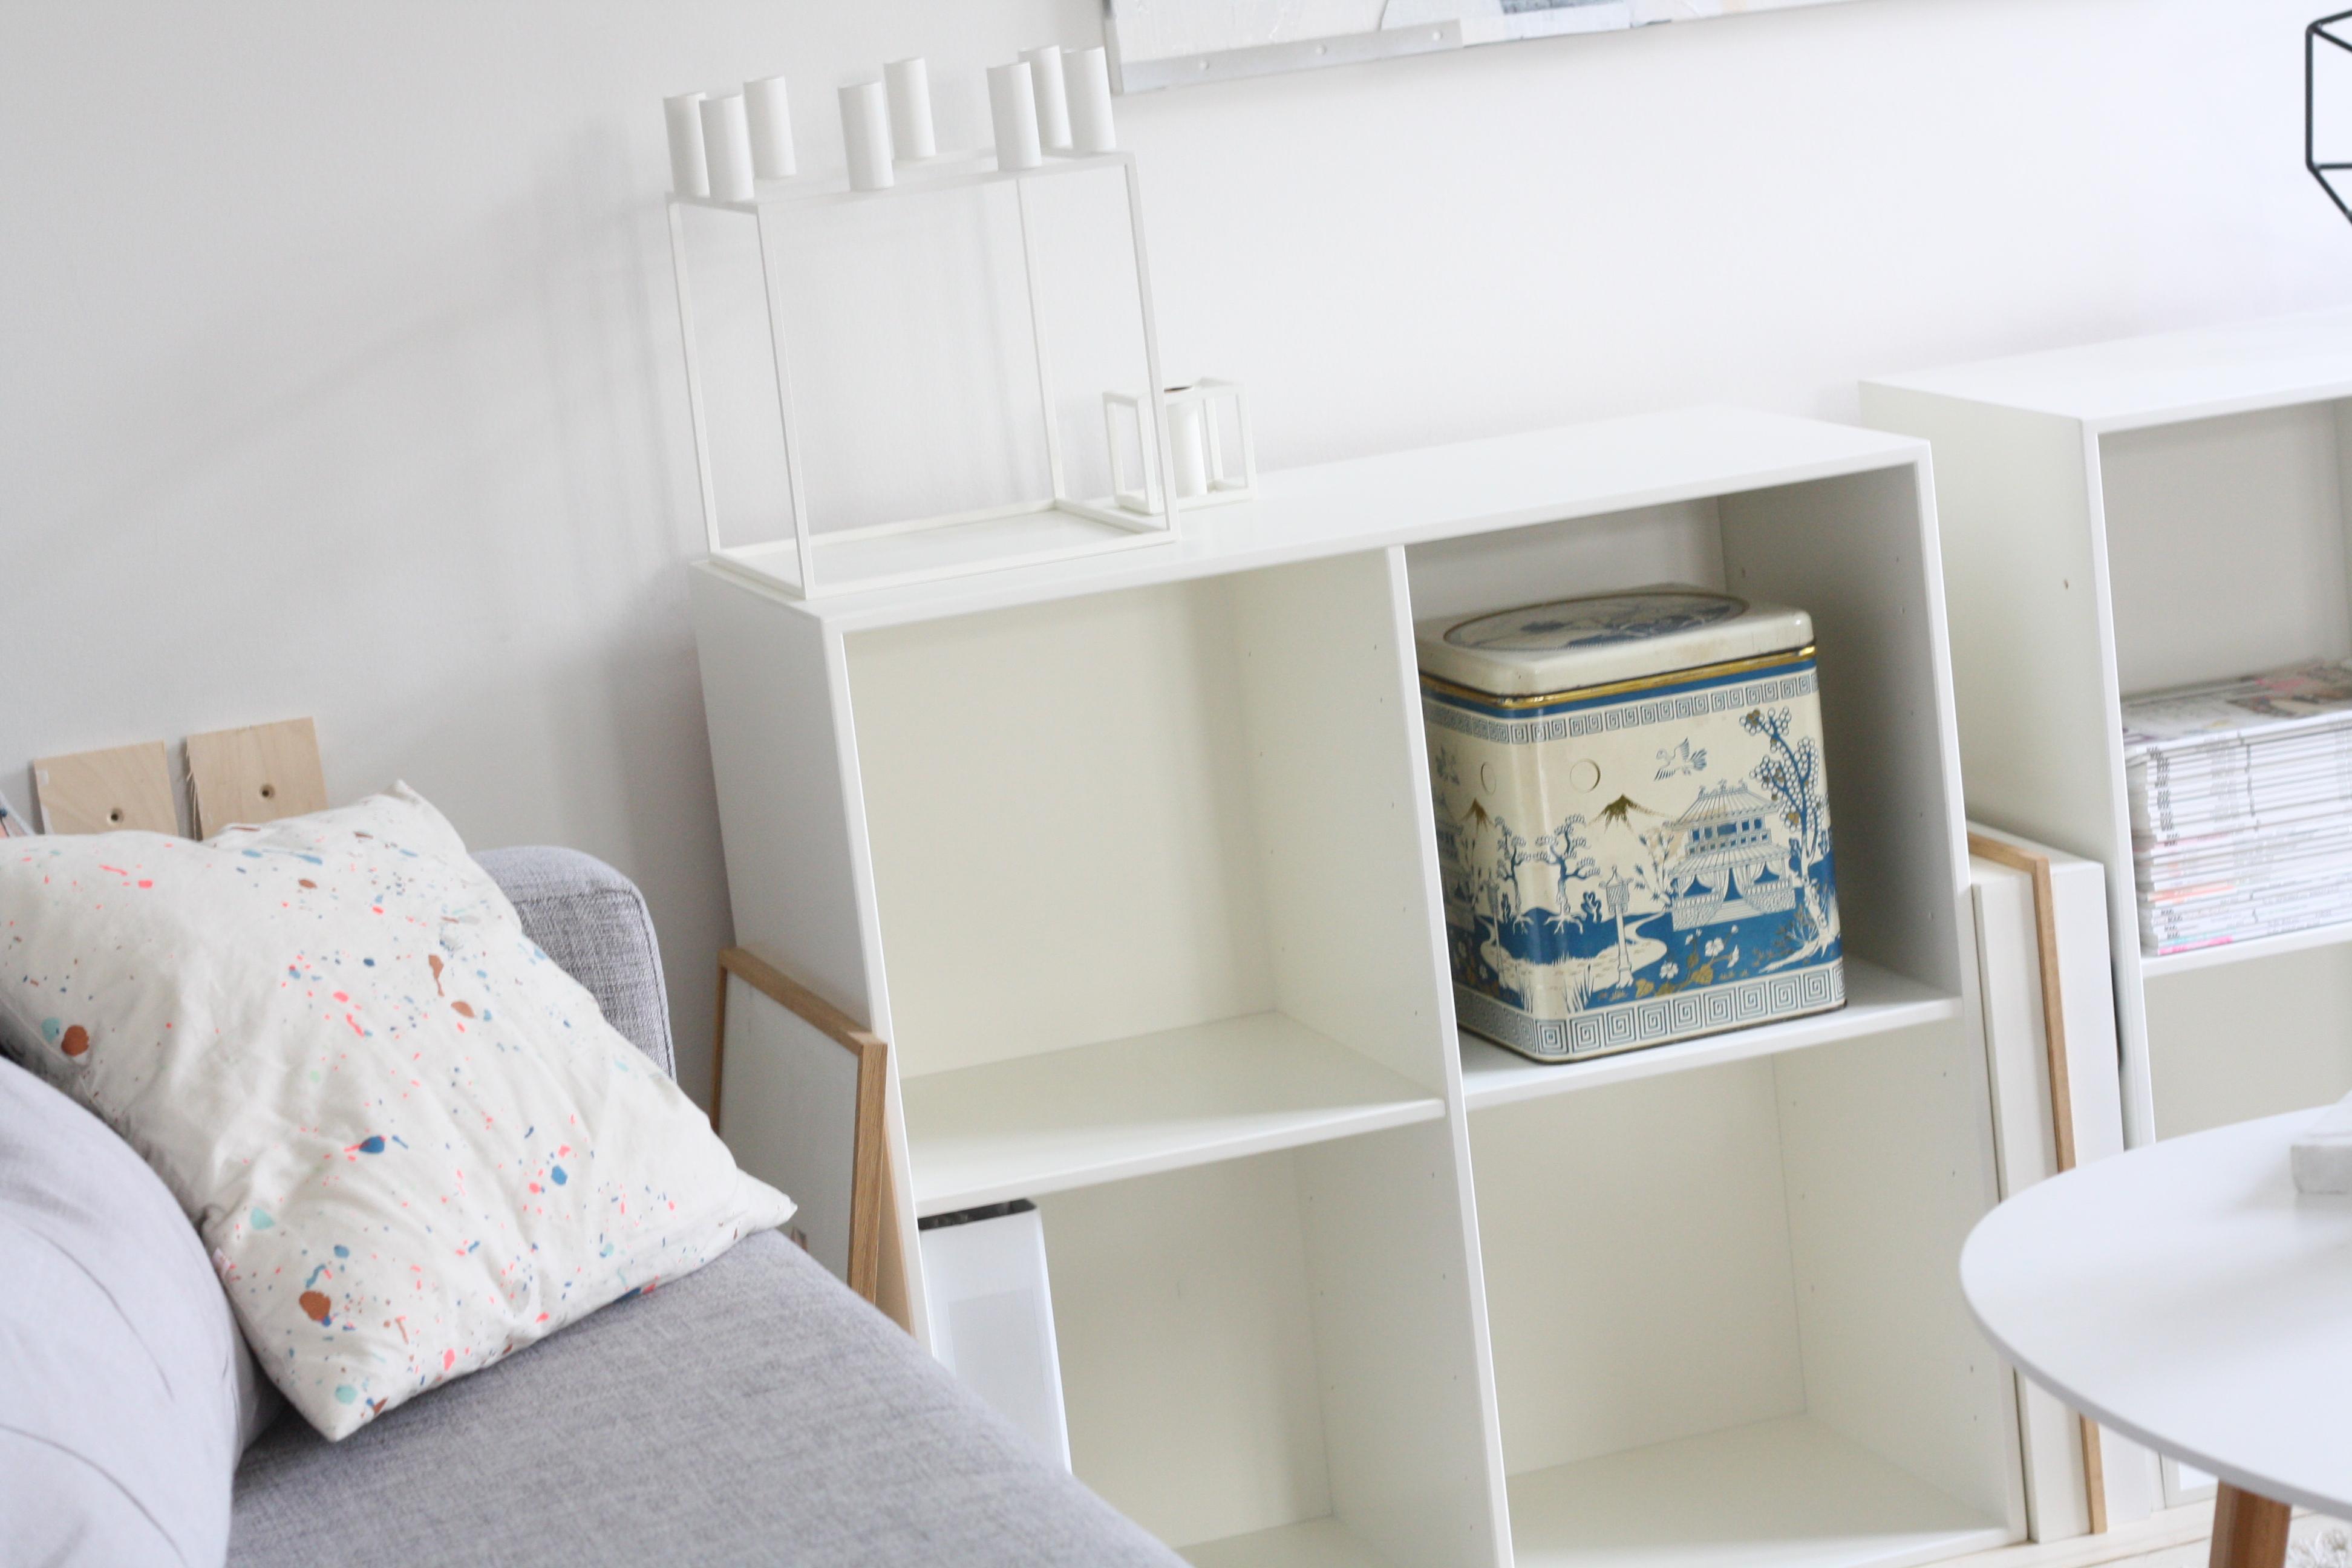 ny stue_bolig_indretning_makeover_7